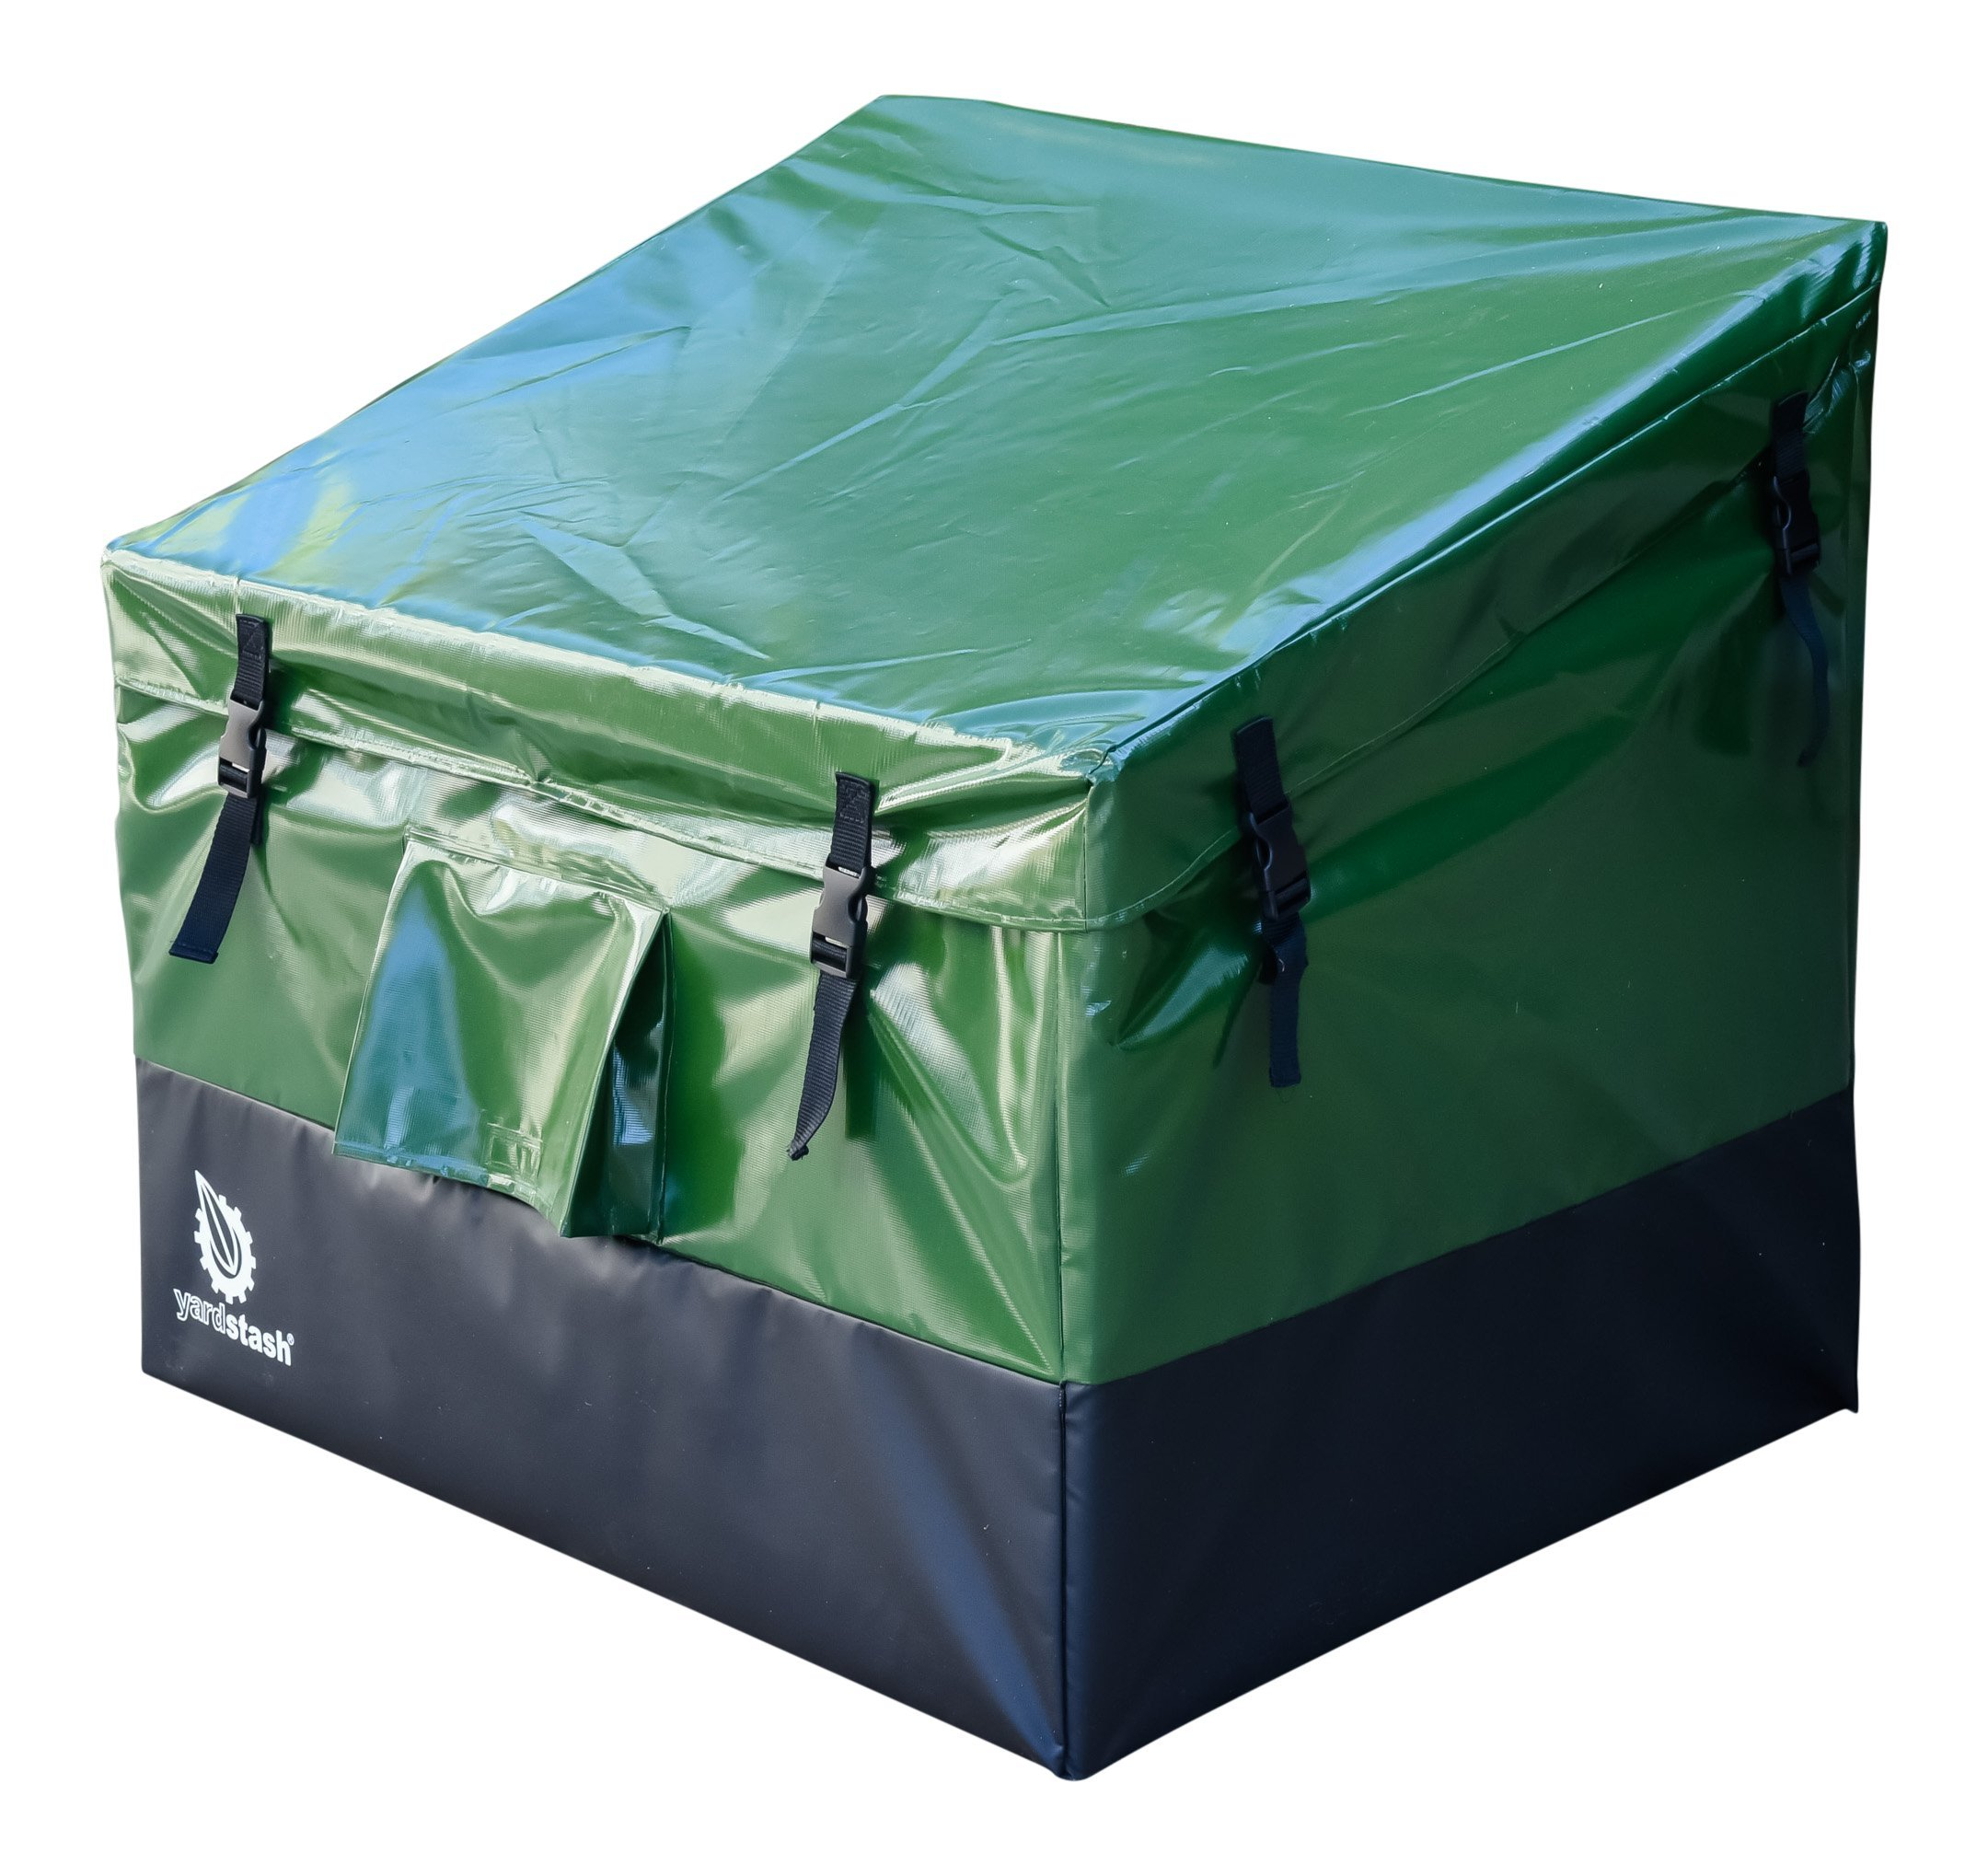 YardStash Outdoor Storage Deck Box Medium: Easy Assembly, Portable, Versatile. Stash Your Outdoor Stuff! by YardStash